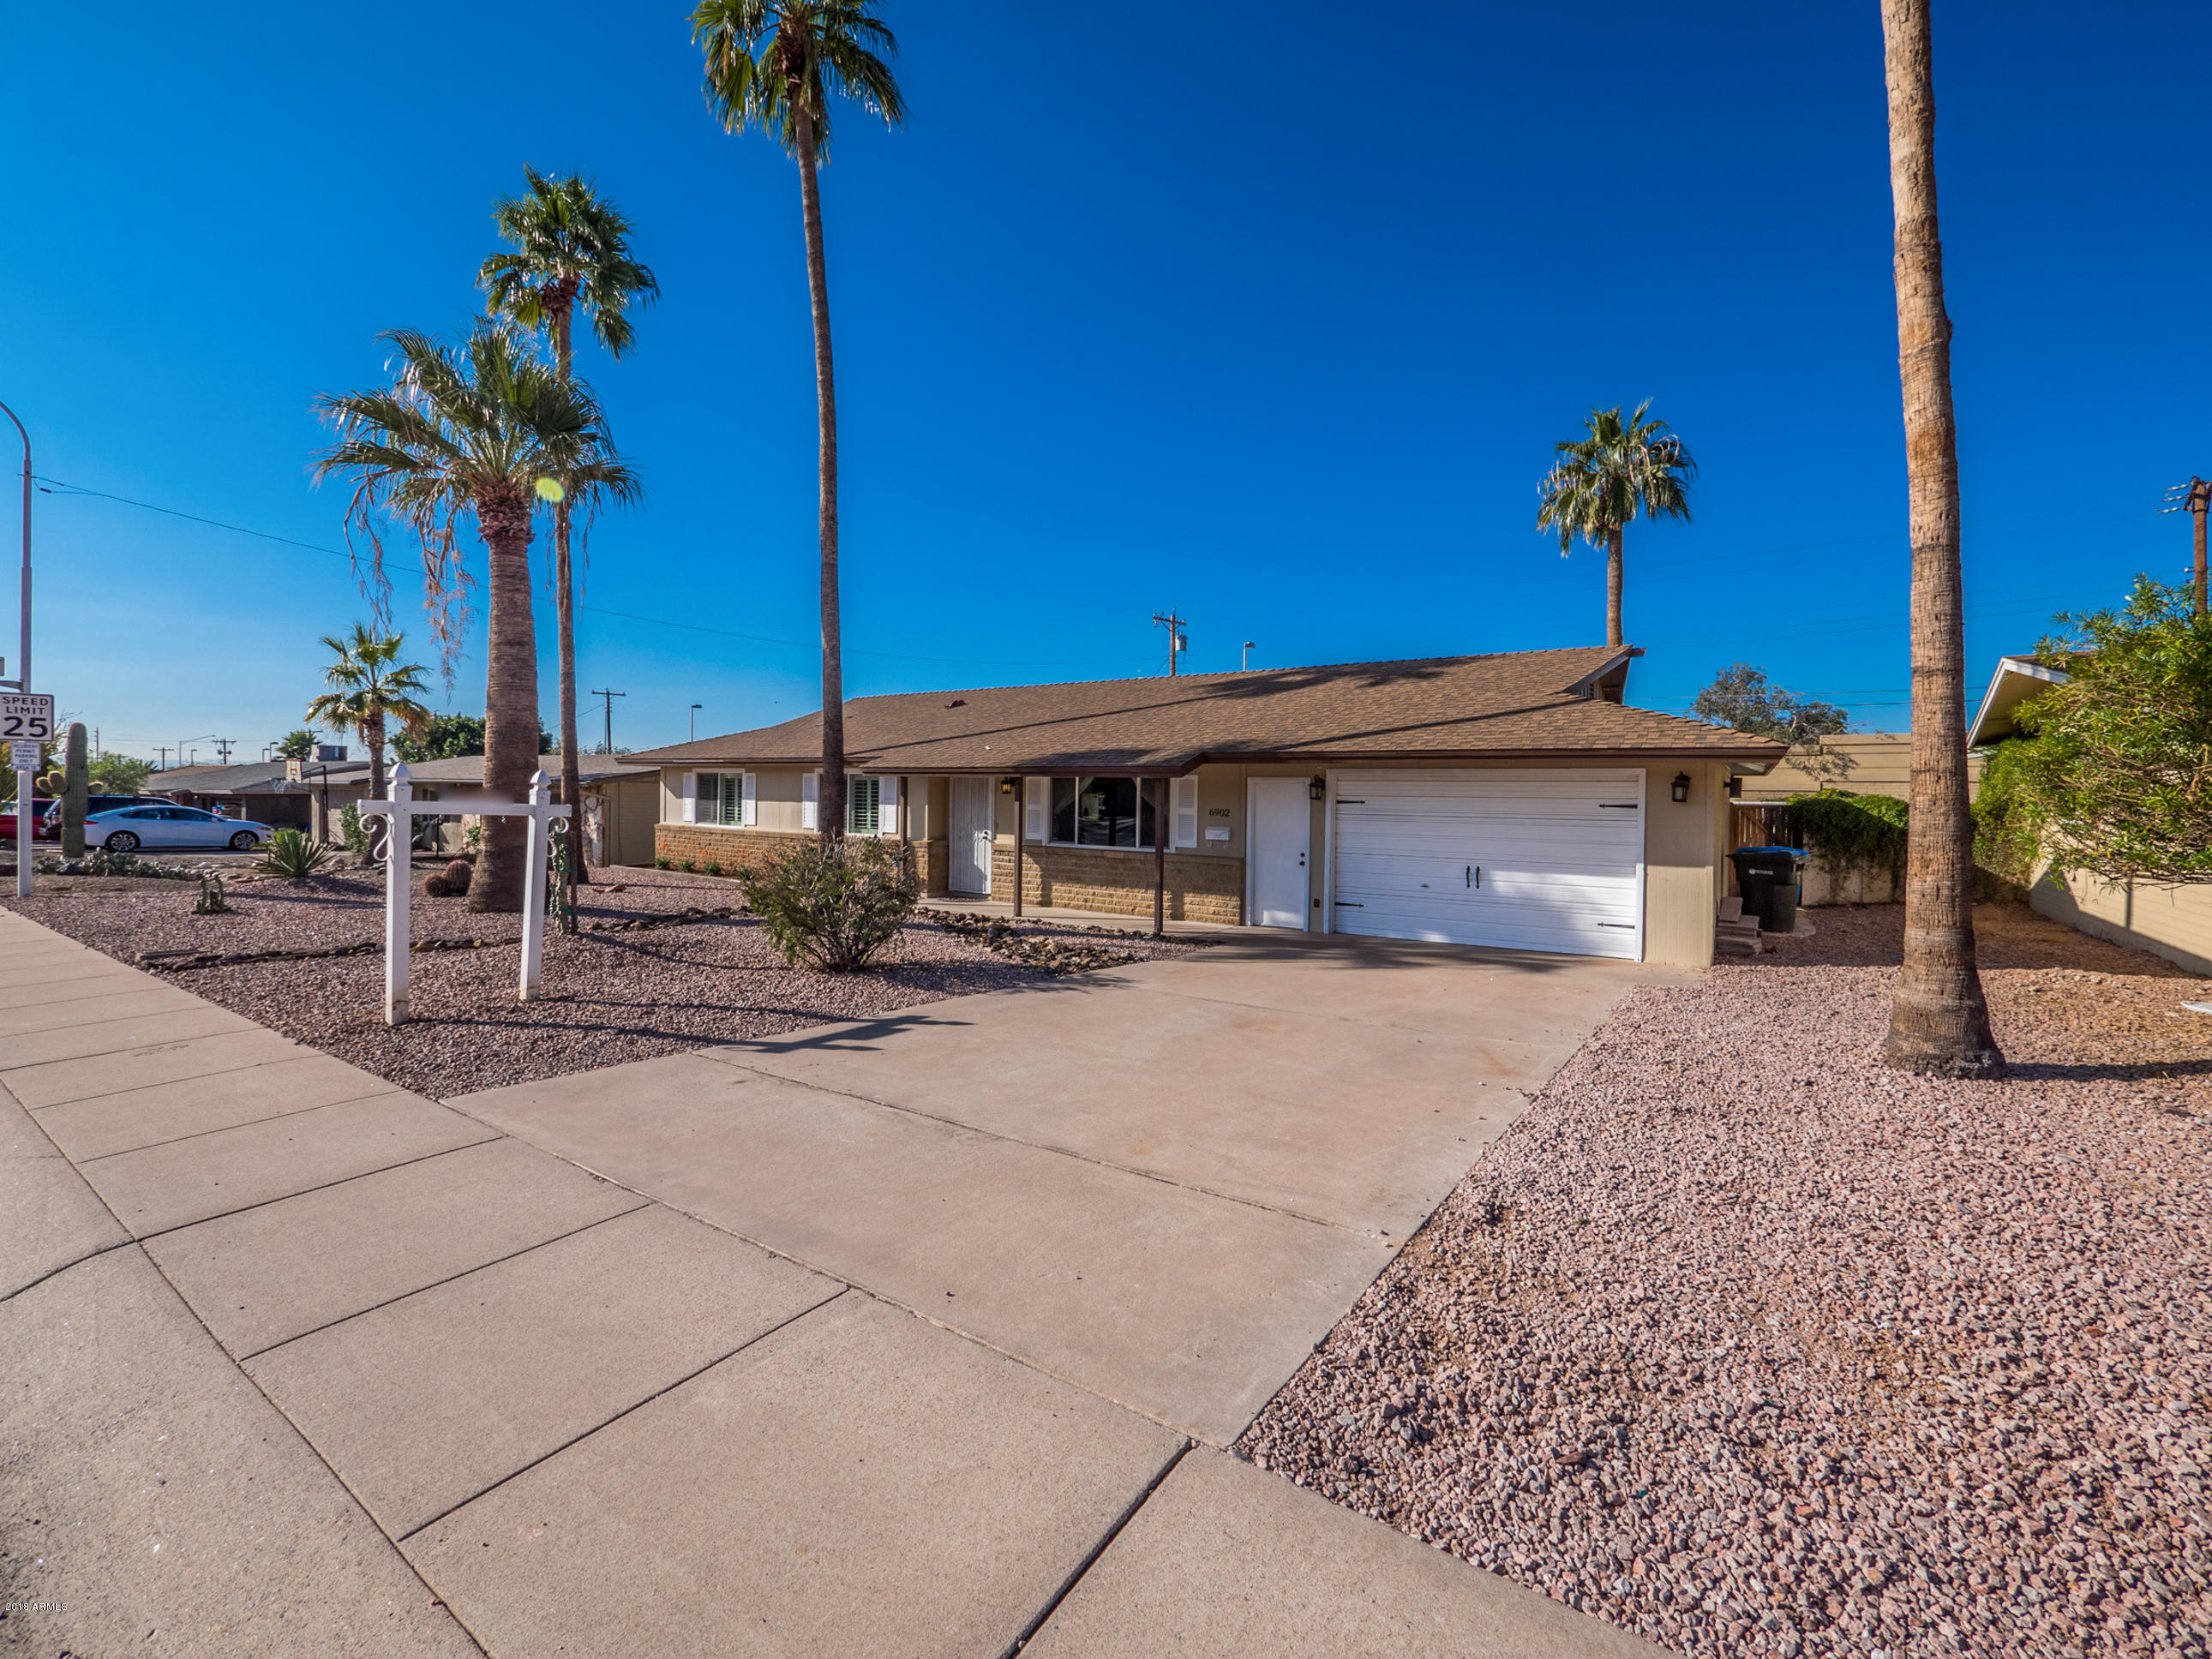 Photo of 6902 N 19TH Street, Phoenix, AZ 85016